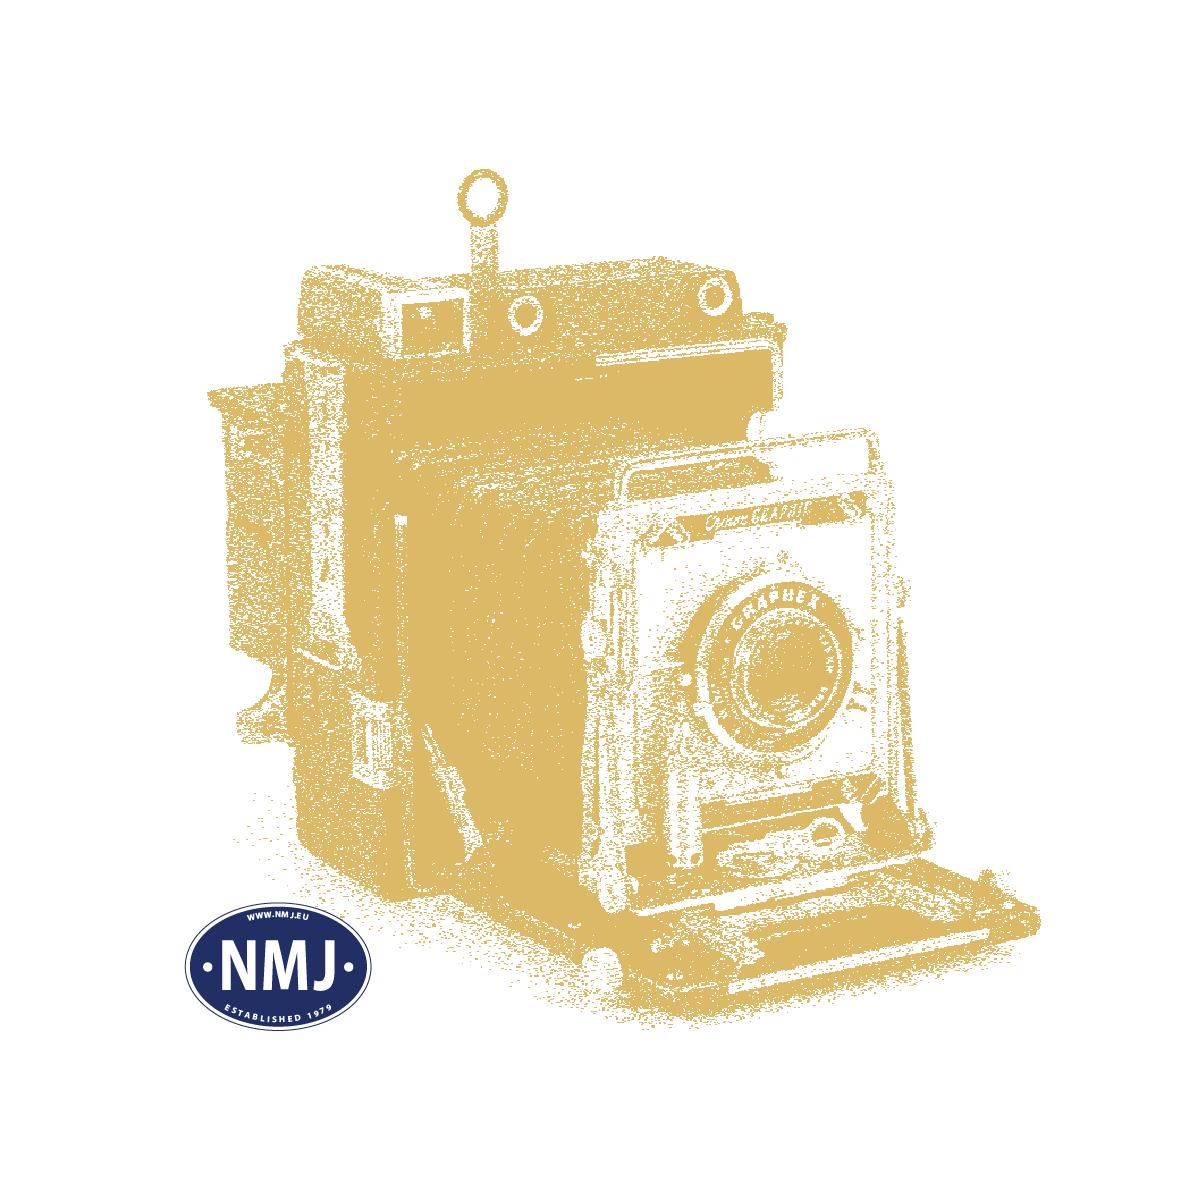 NMJT85.202AC - NMJ Topline CargoNet Di8.707, AC